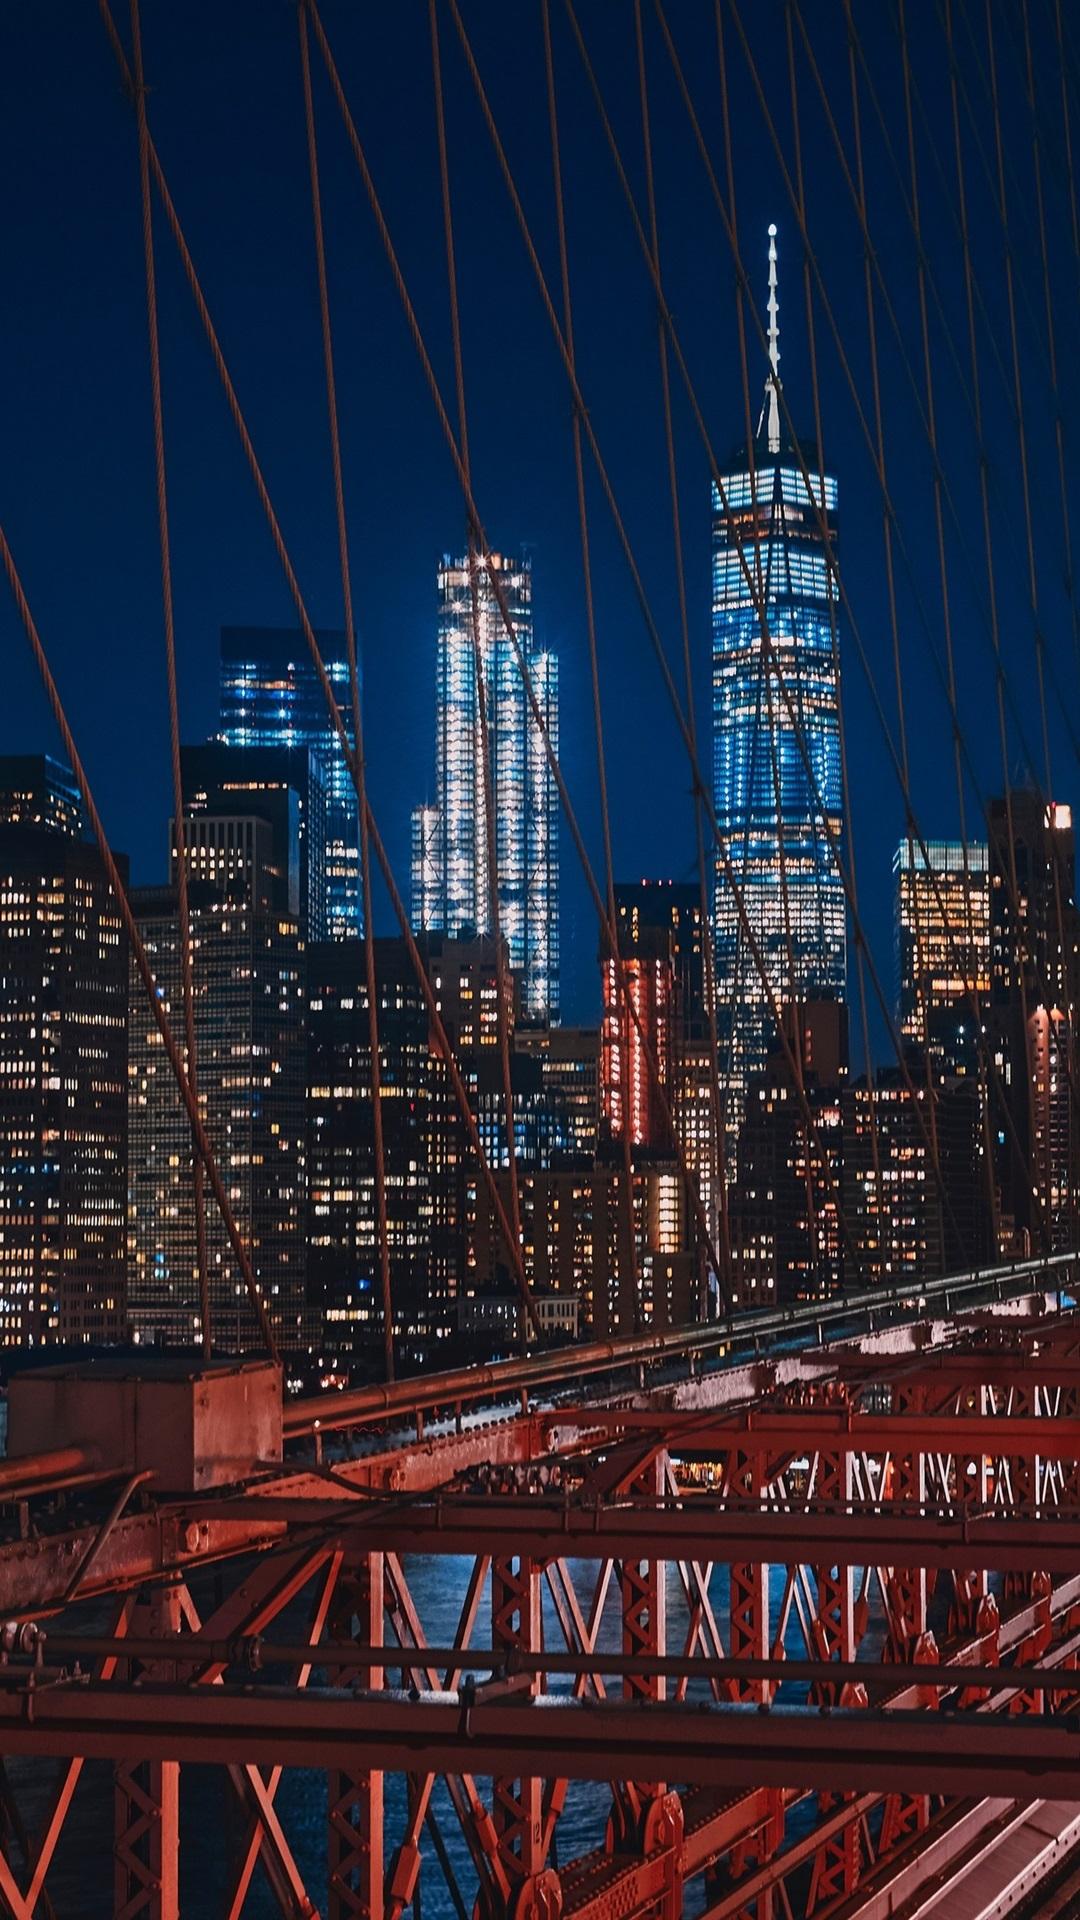 Iphone Wallpaper New York, Usa, Brooklyn, Bridge, Night, - Night Iphone Wallpaper New York - HD Wallpaper